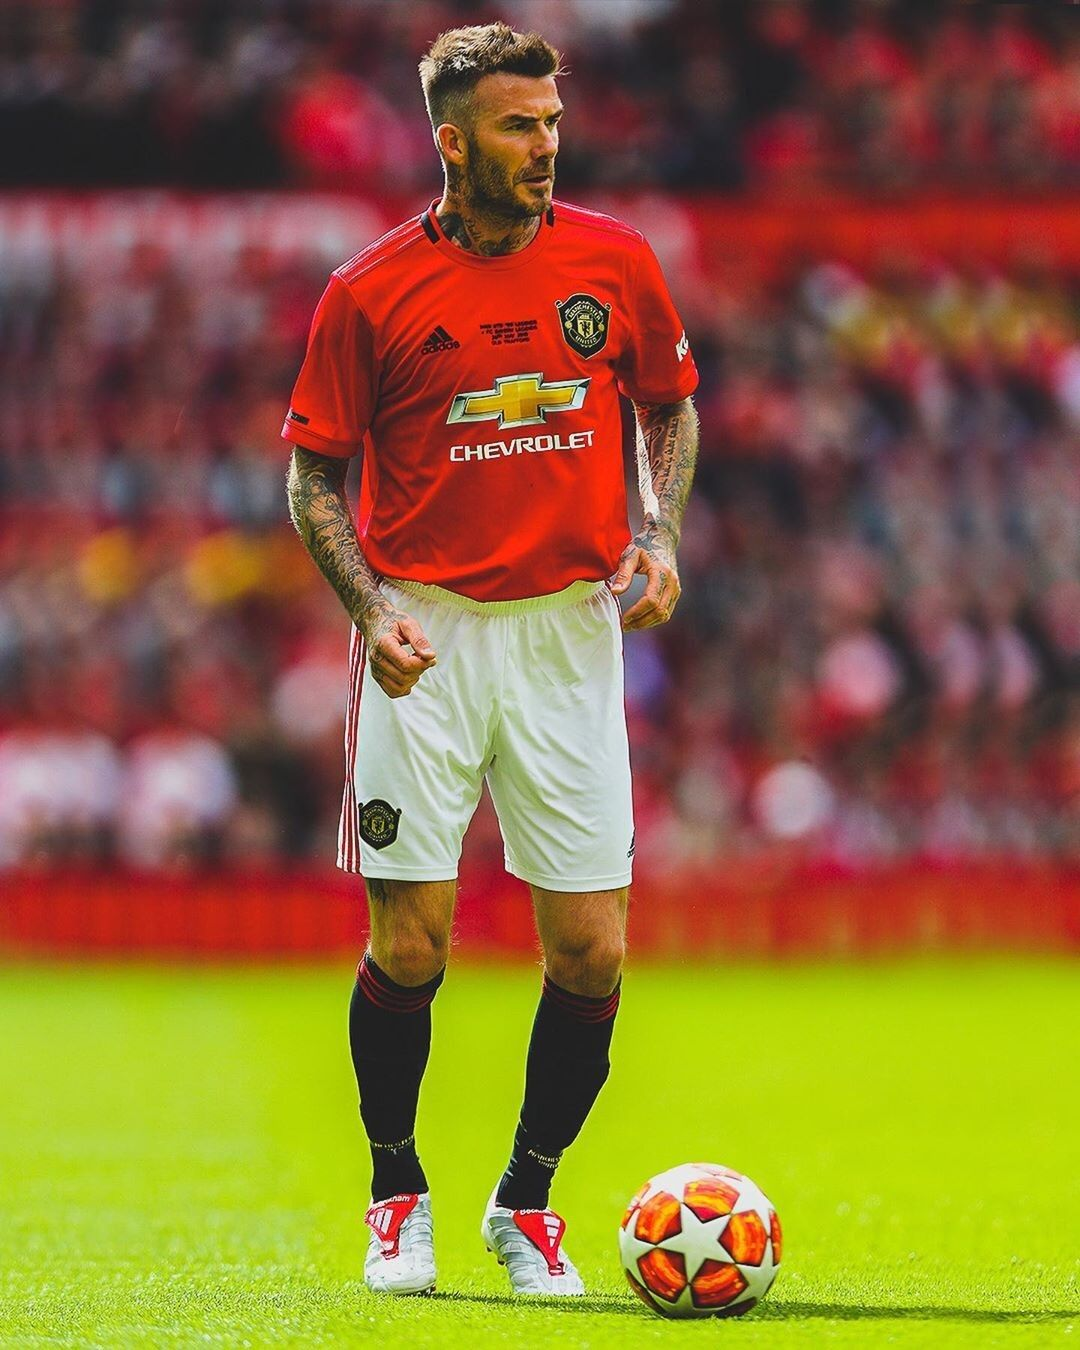 Football image by Mitadru Gupta Manchester united